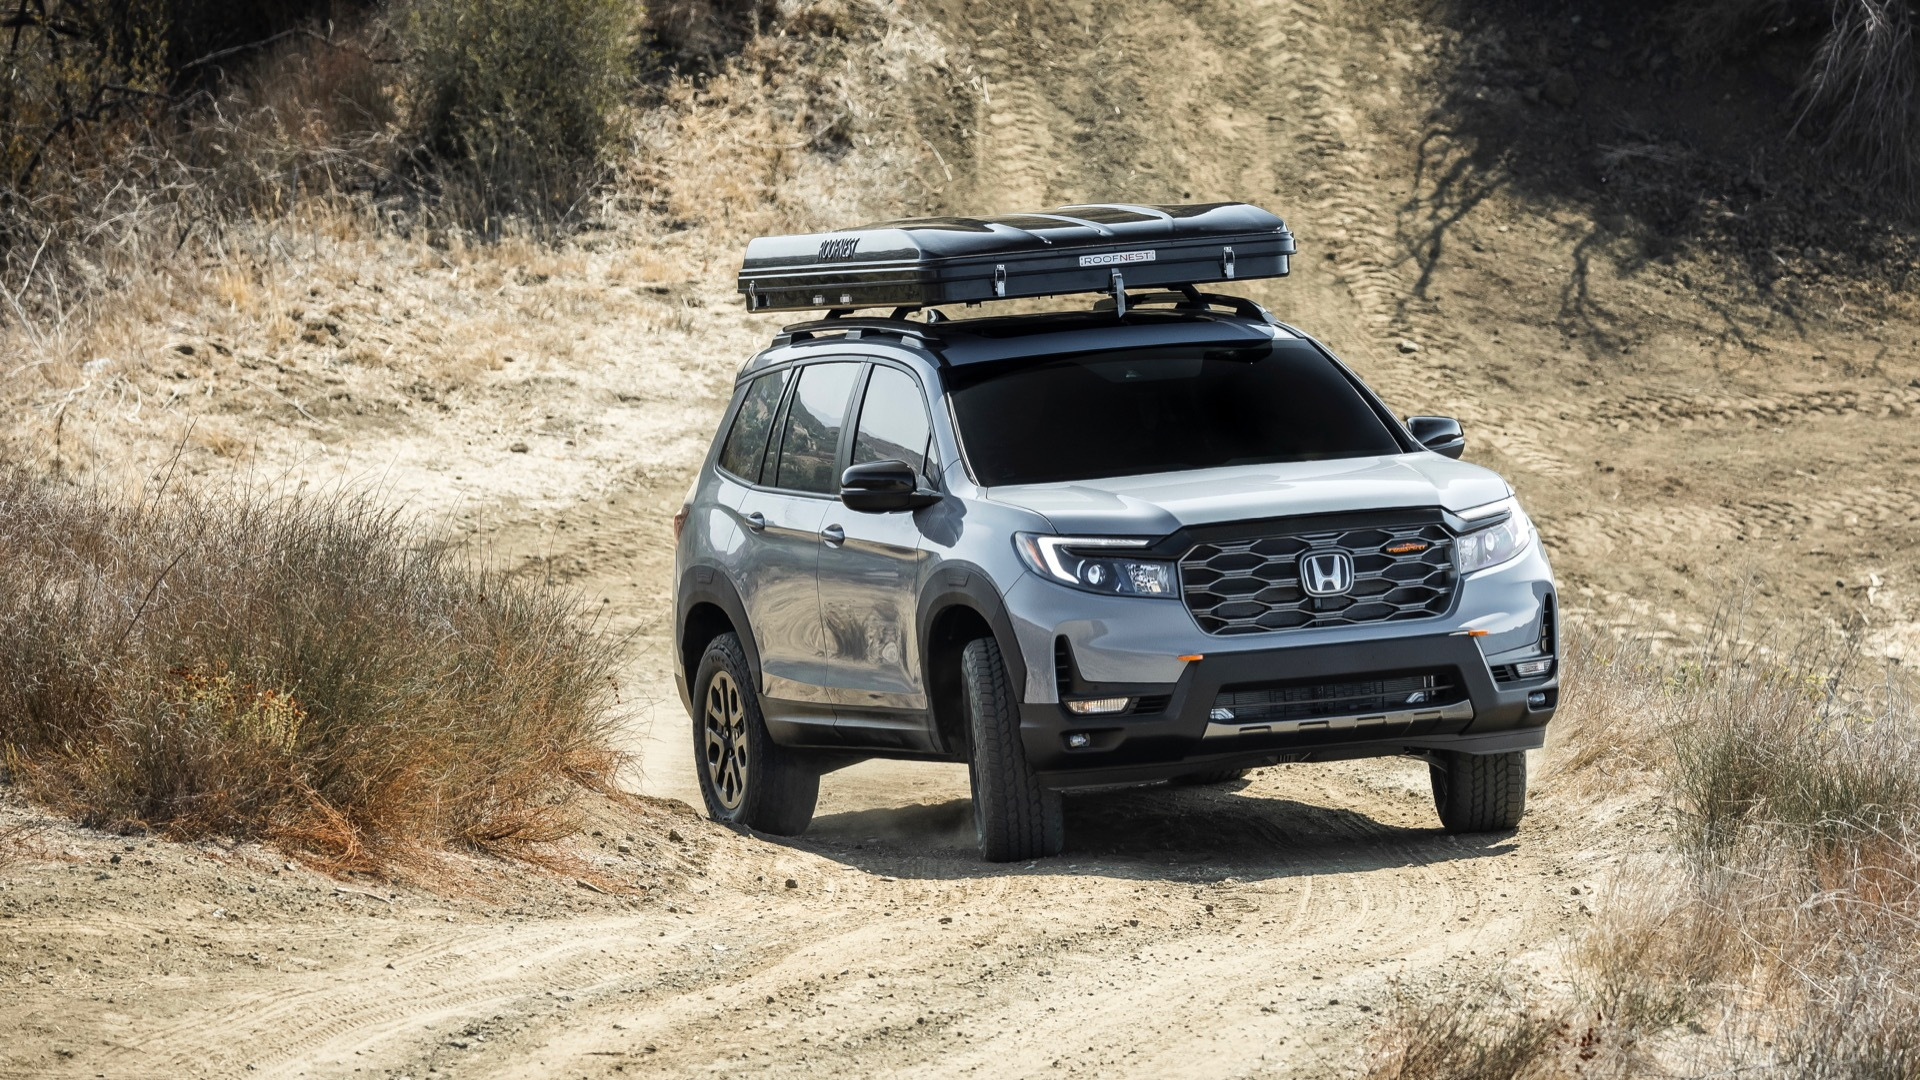 Honda Passport TrailSport Rugged Roads Project